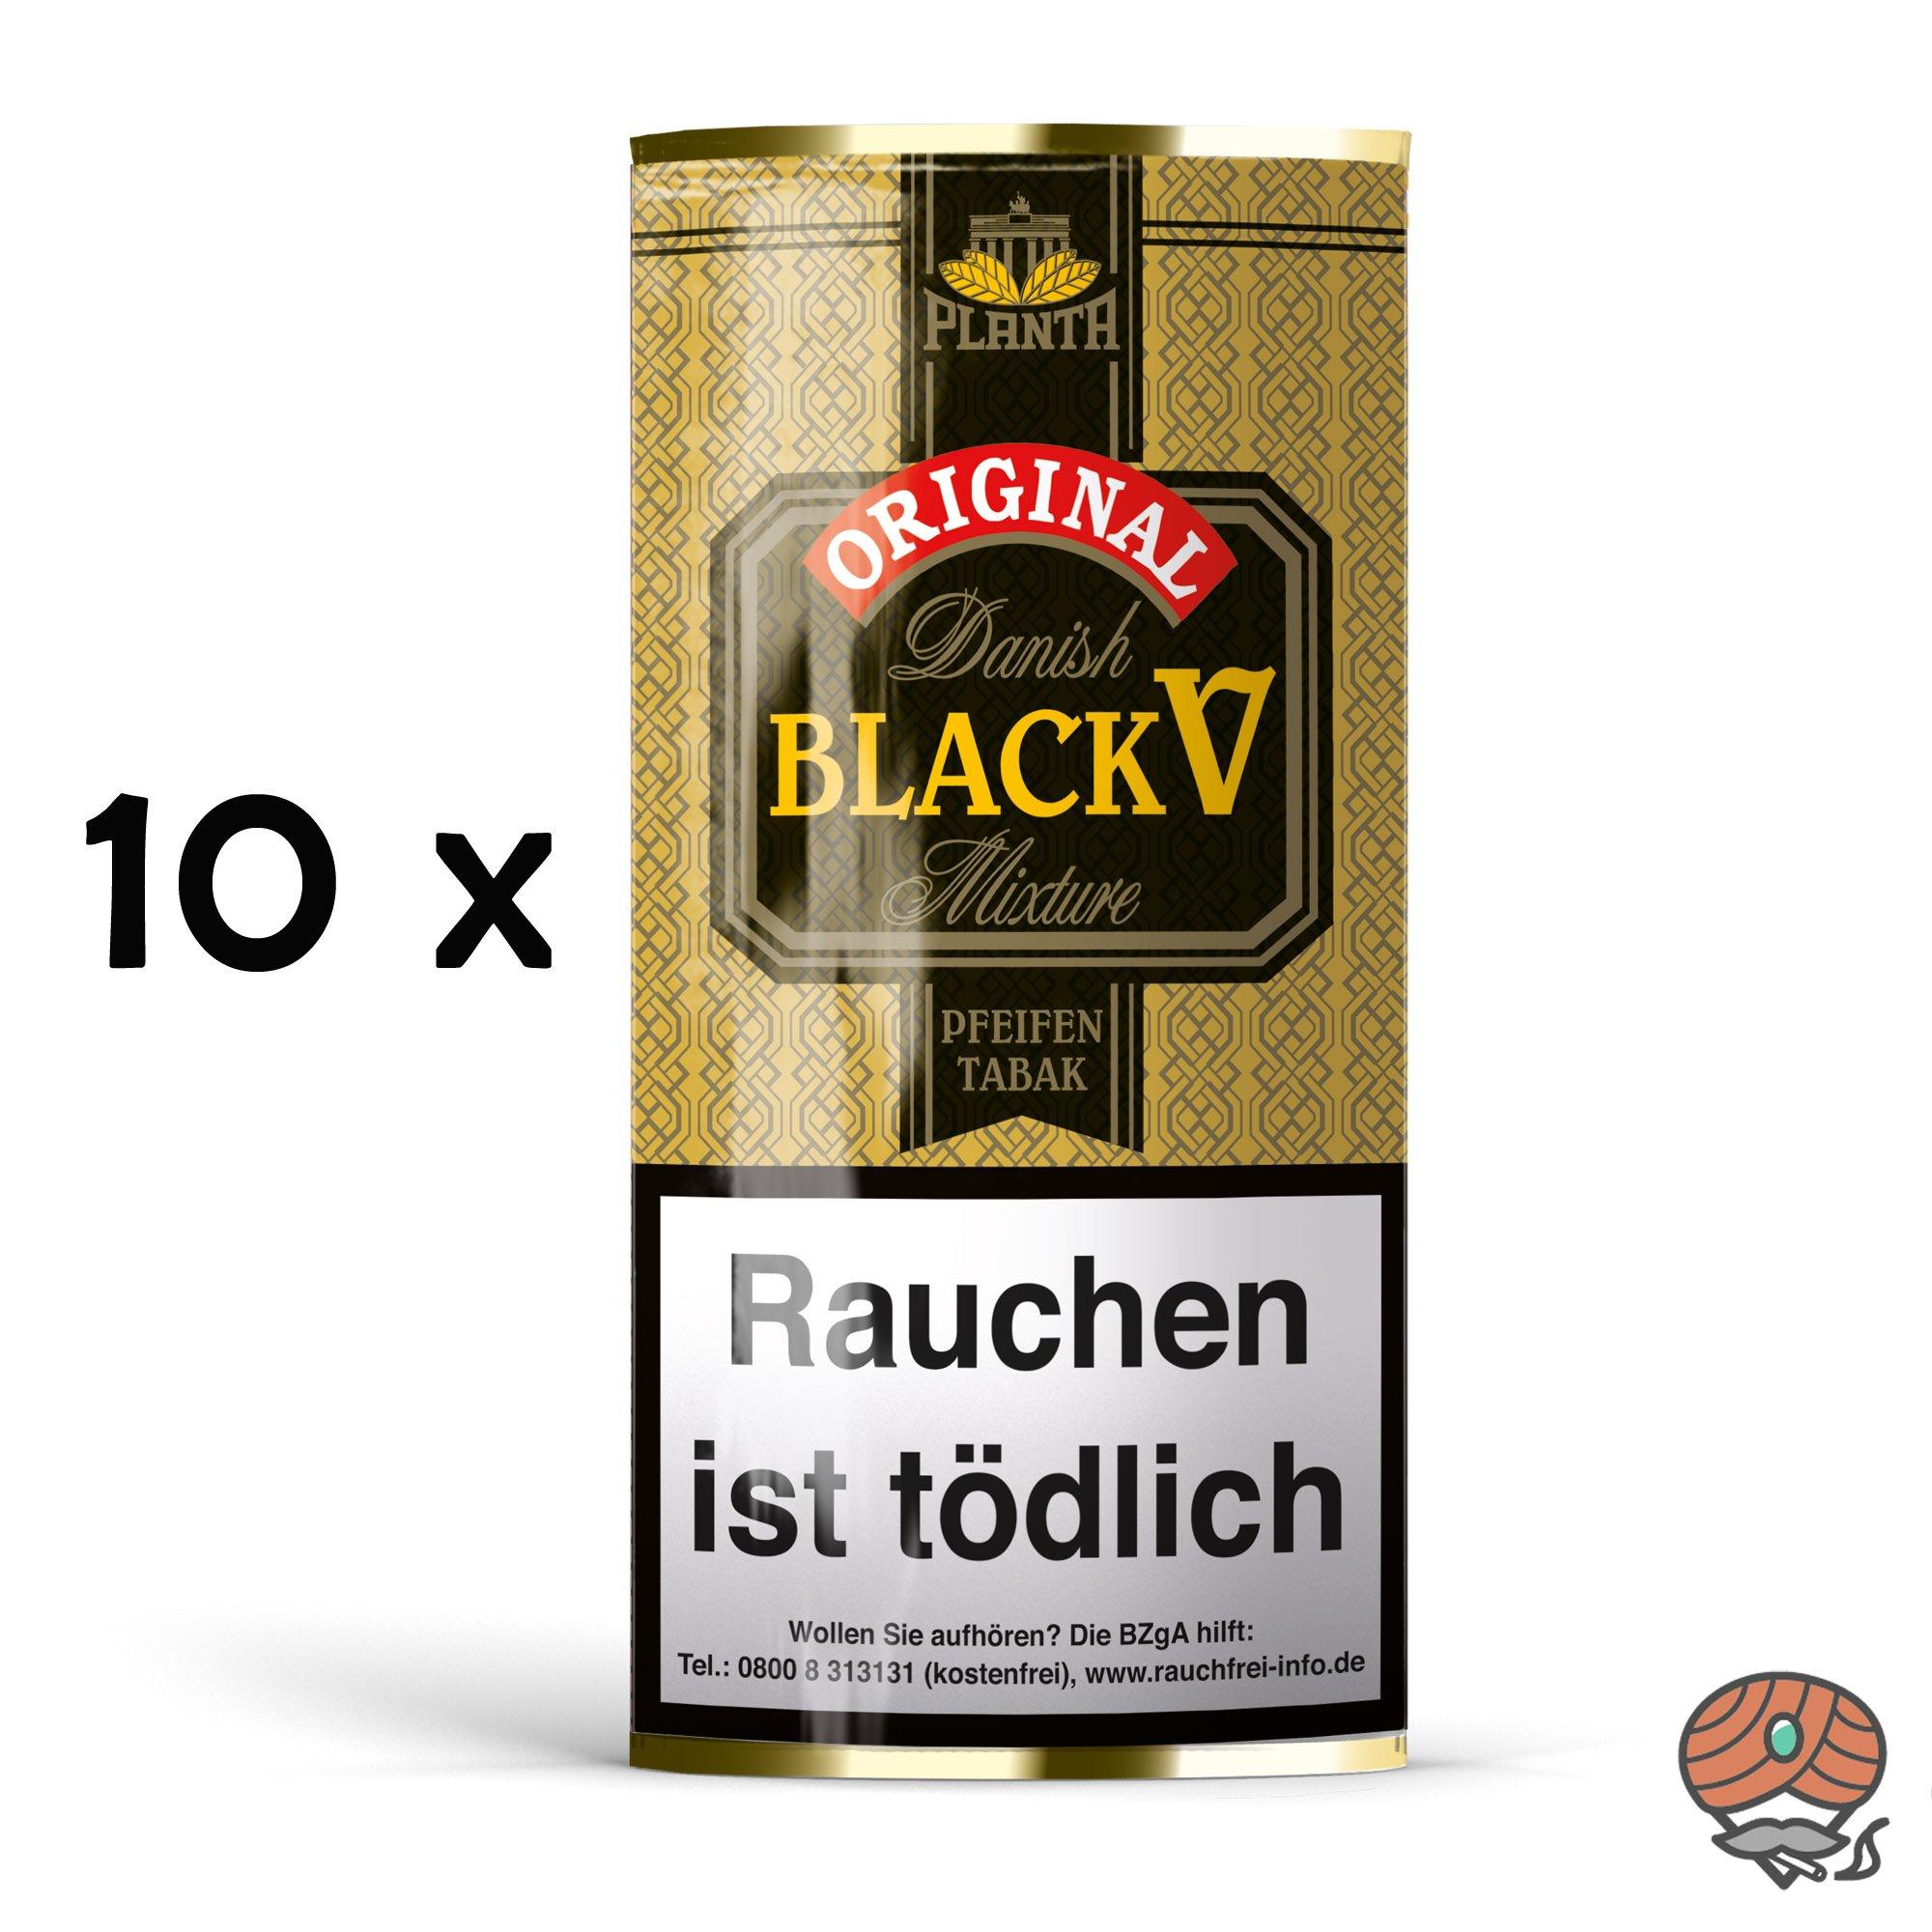 10x Danish Black V Pfeifentabak Vanille Aroma à 40g